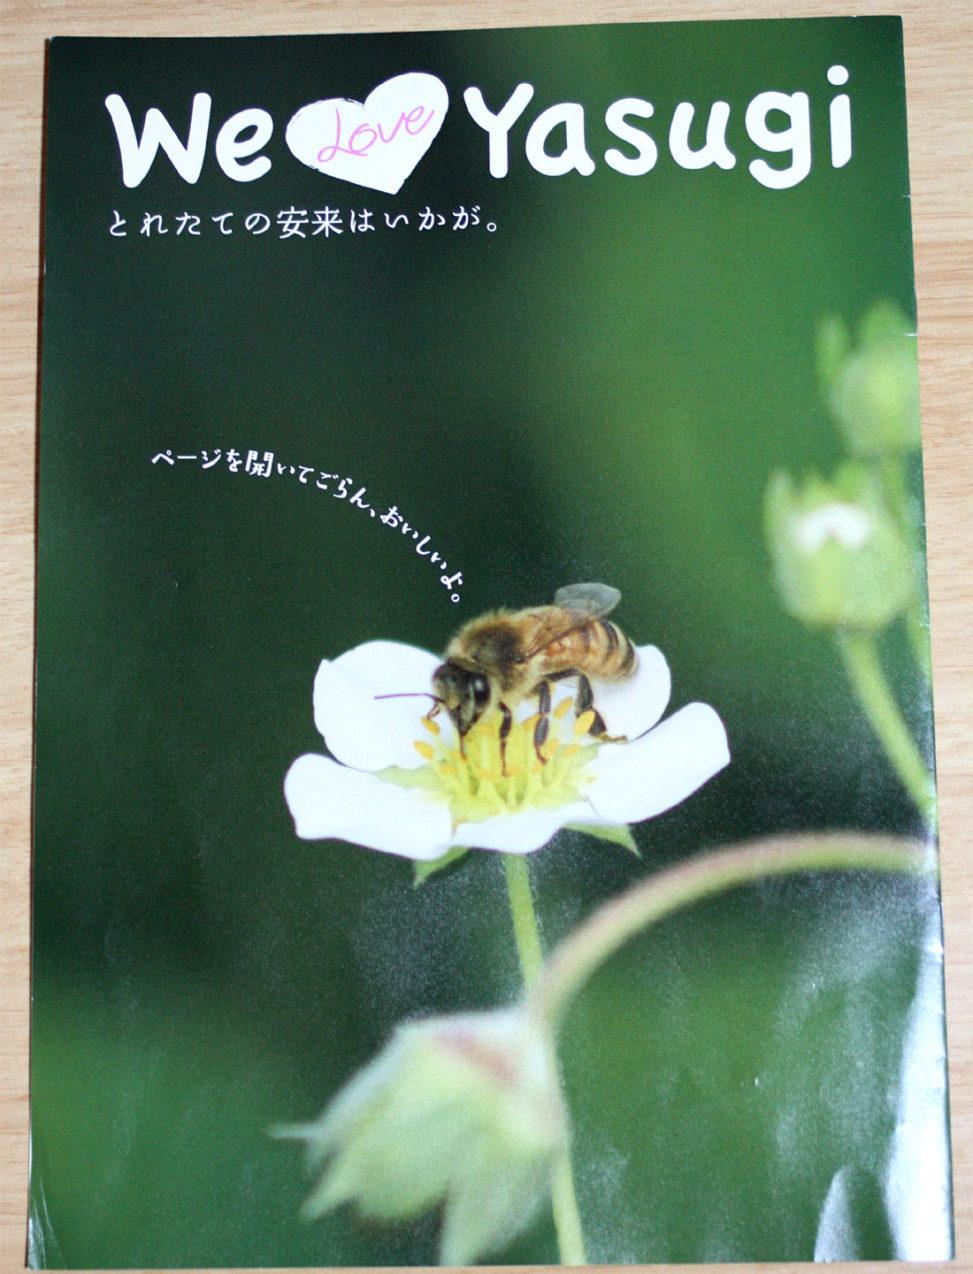 We love Yasugi 安来紹介